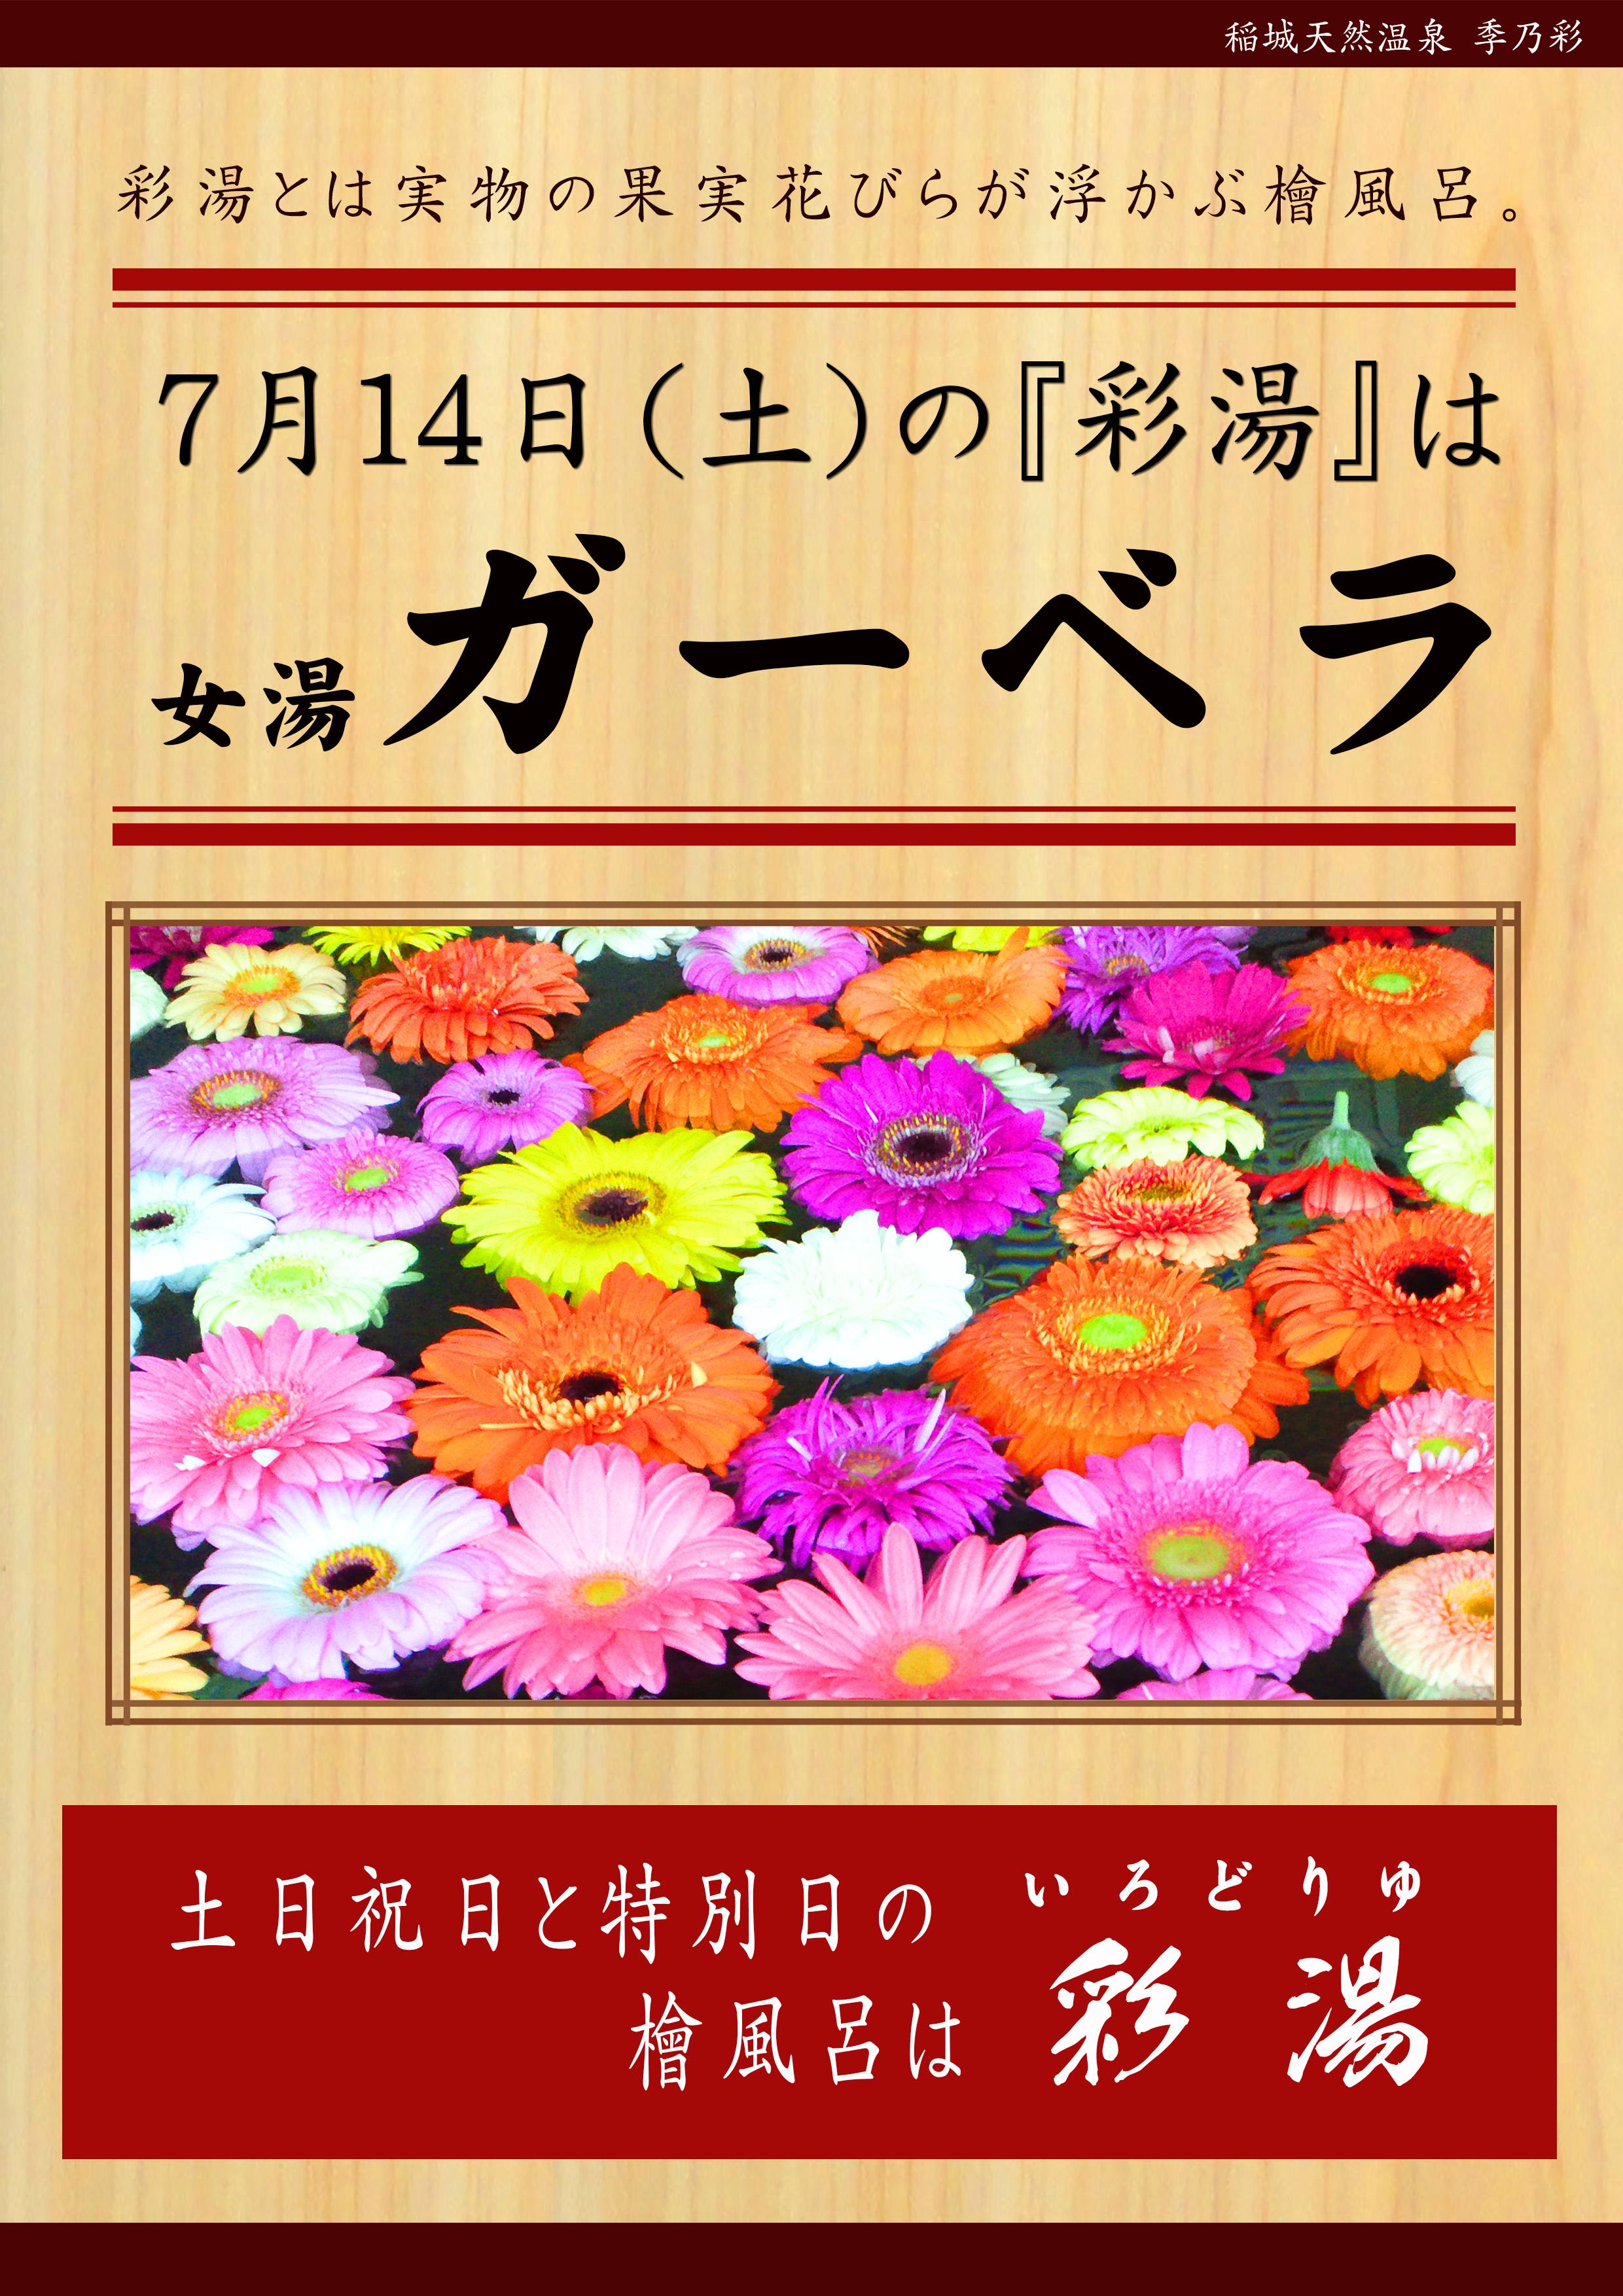 20180714POP イベント 彩湯 ガーベラ